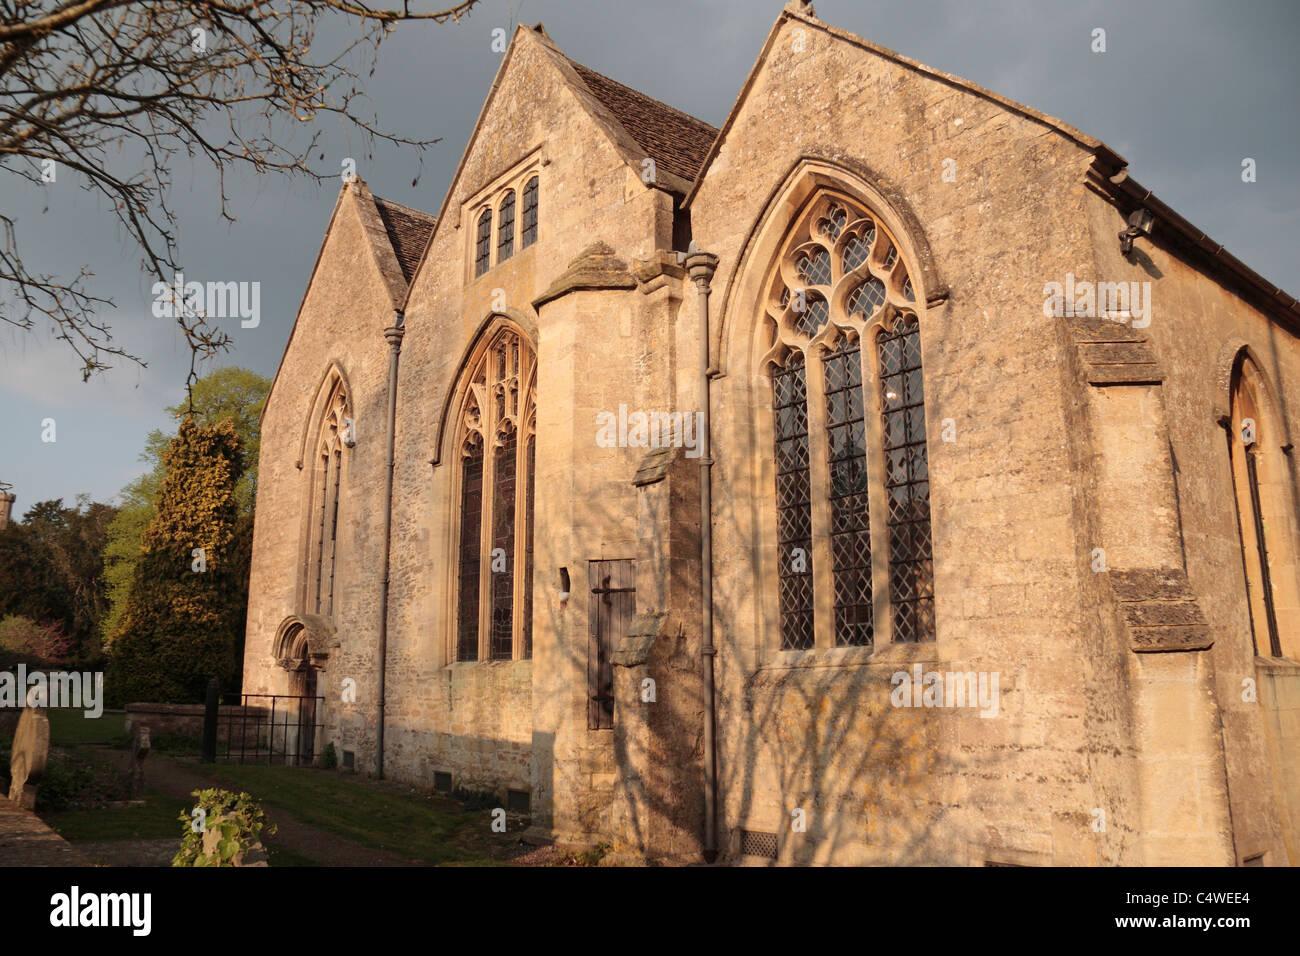 The Saxon Parish Church of St Bartholomew in Corsham, Wiltshire, UK. Stock Photo